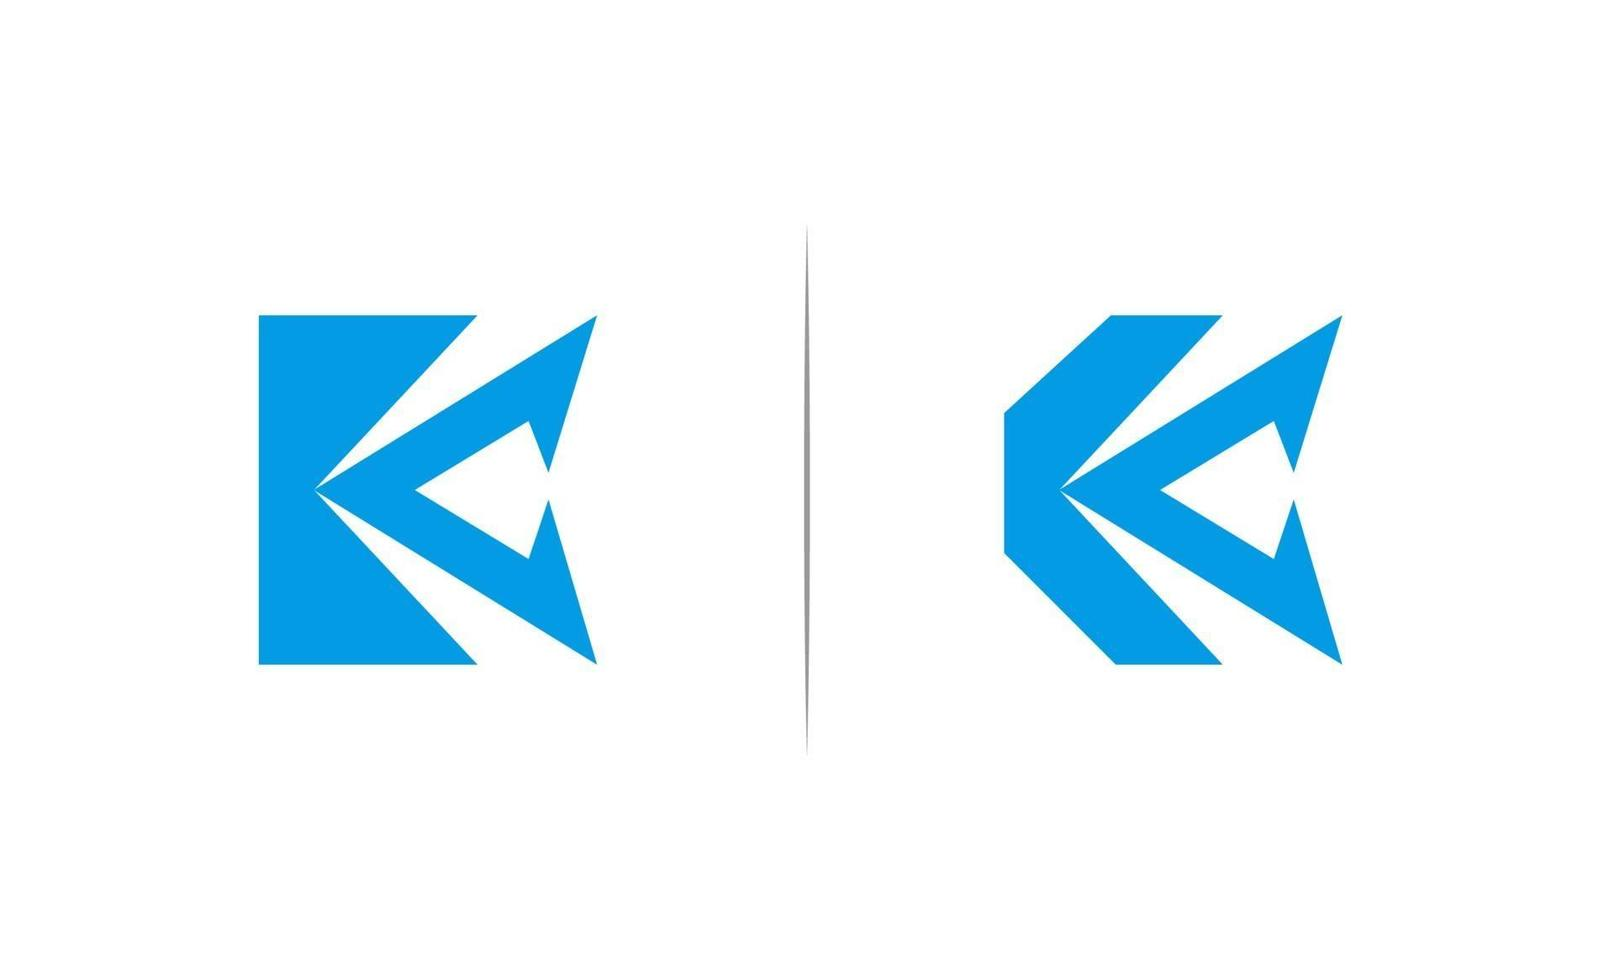 anfänglicher k Logo Design Template Vektor